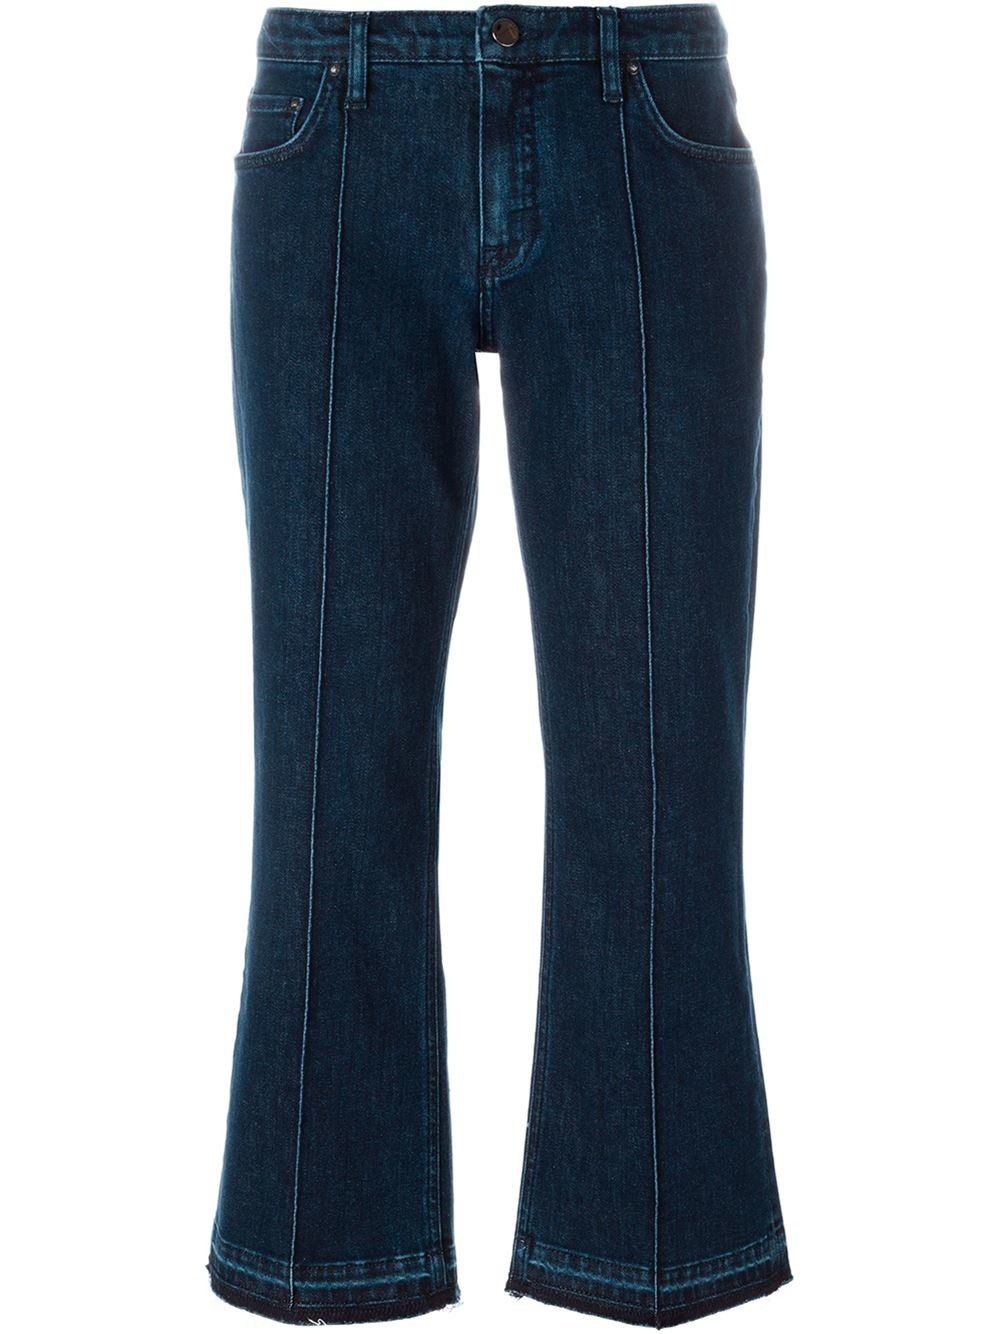 victoria beckham flared cropped jeans in blue lyst. Black Bedroom Furniture Sets. Home Design Ideas